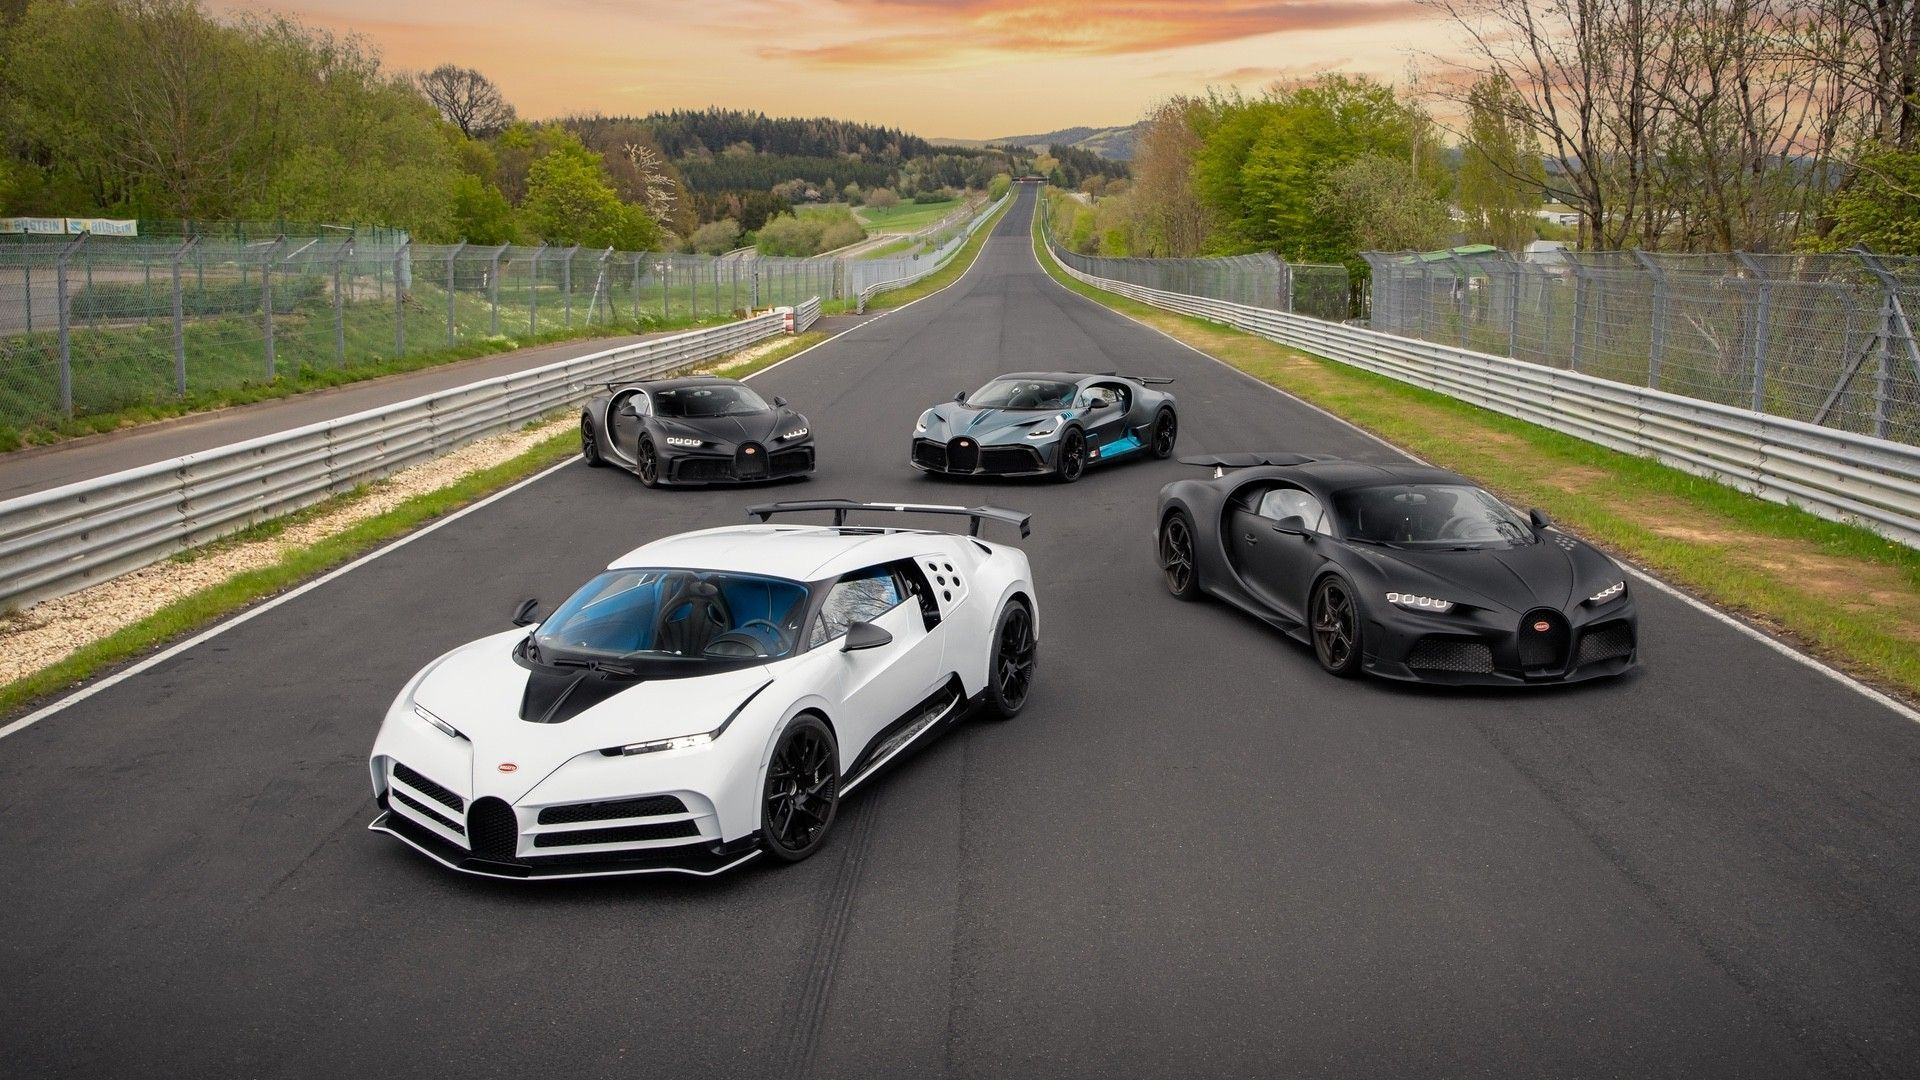 04_bugatti-lineup_nbr